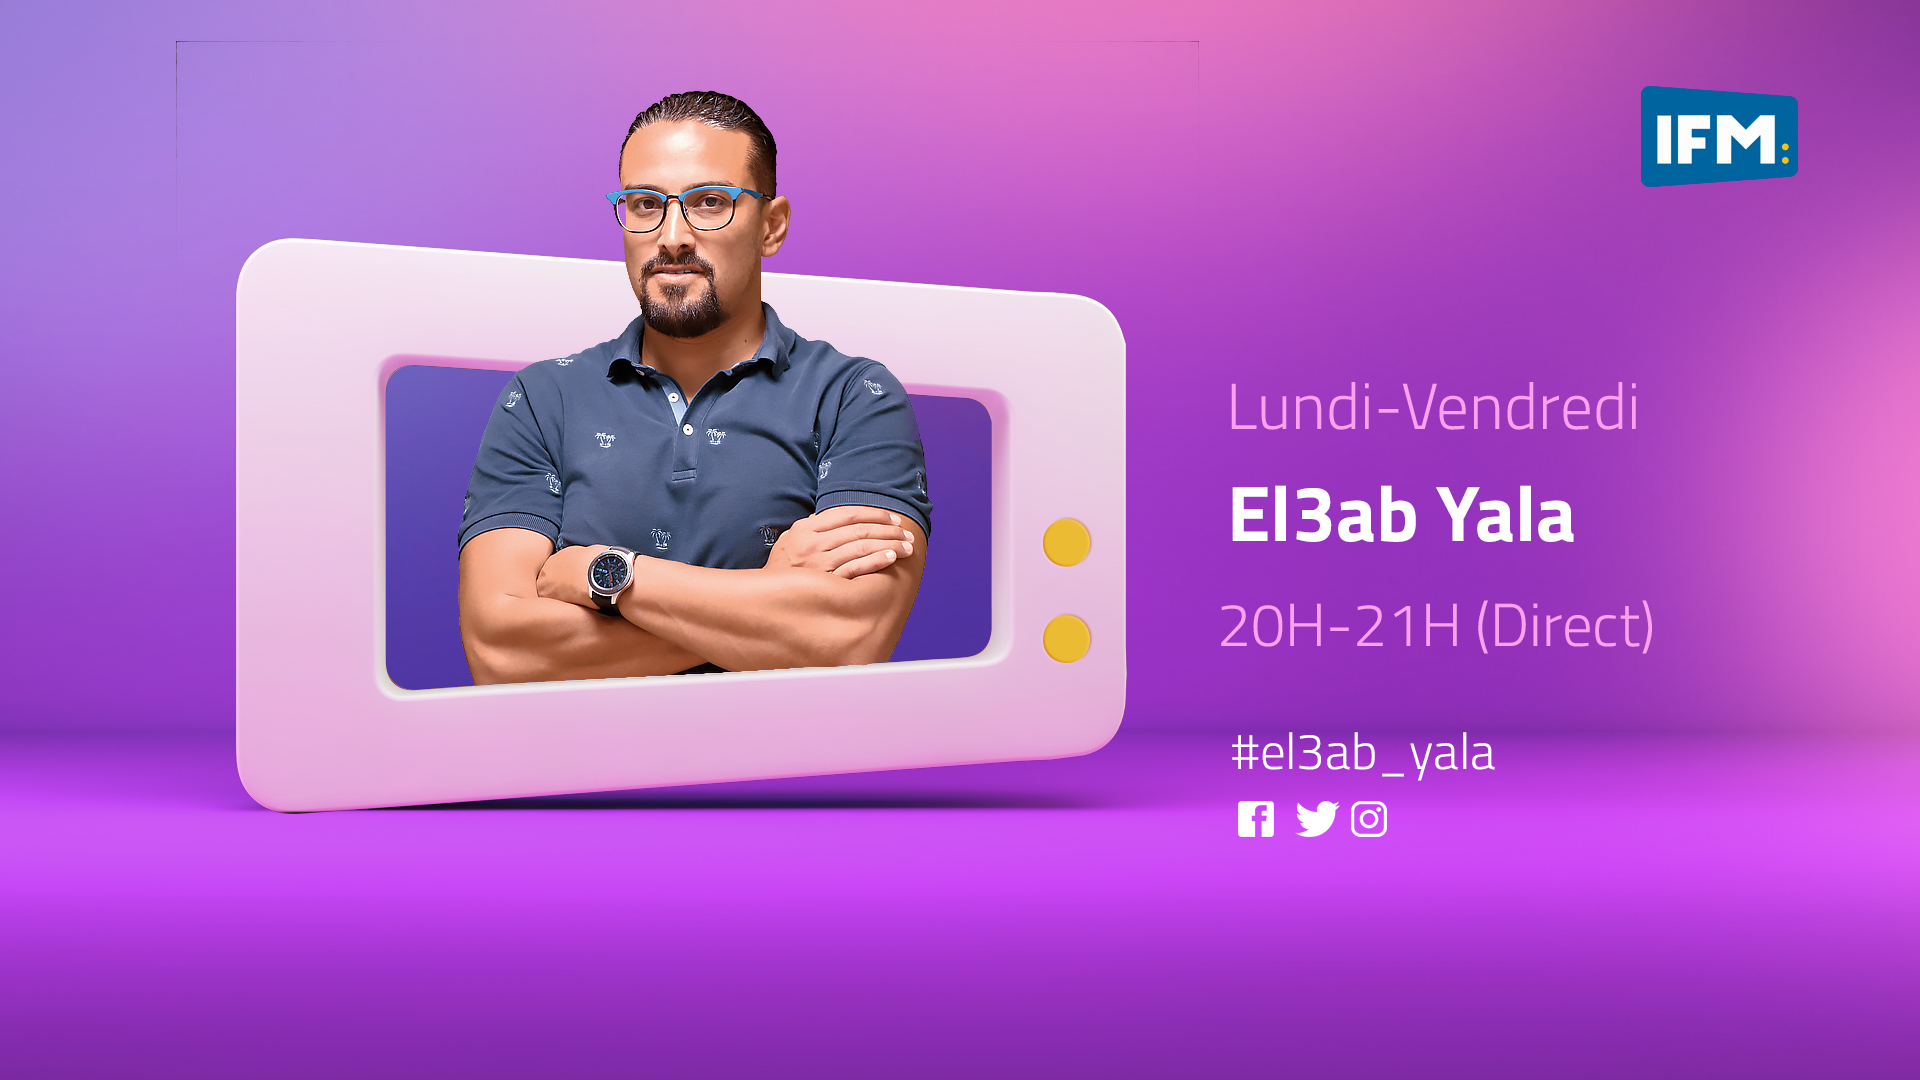 El3ab Yala